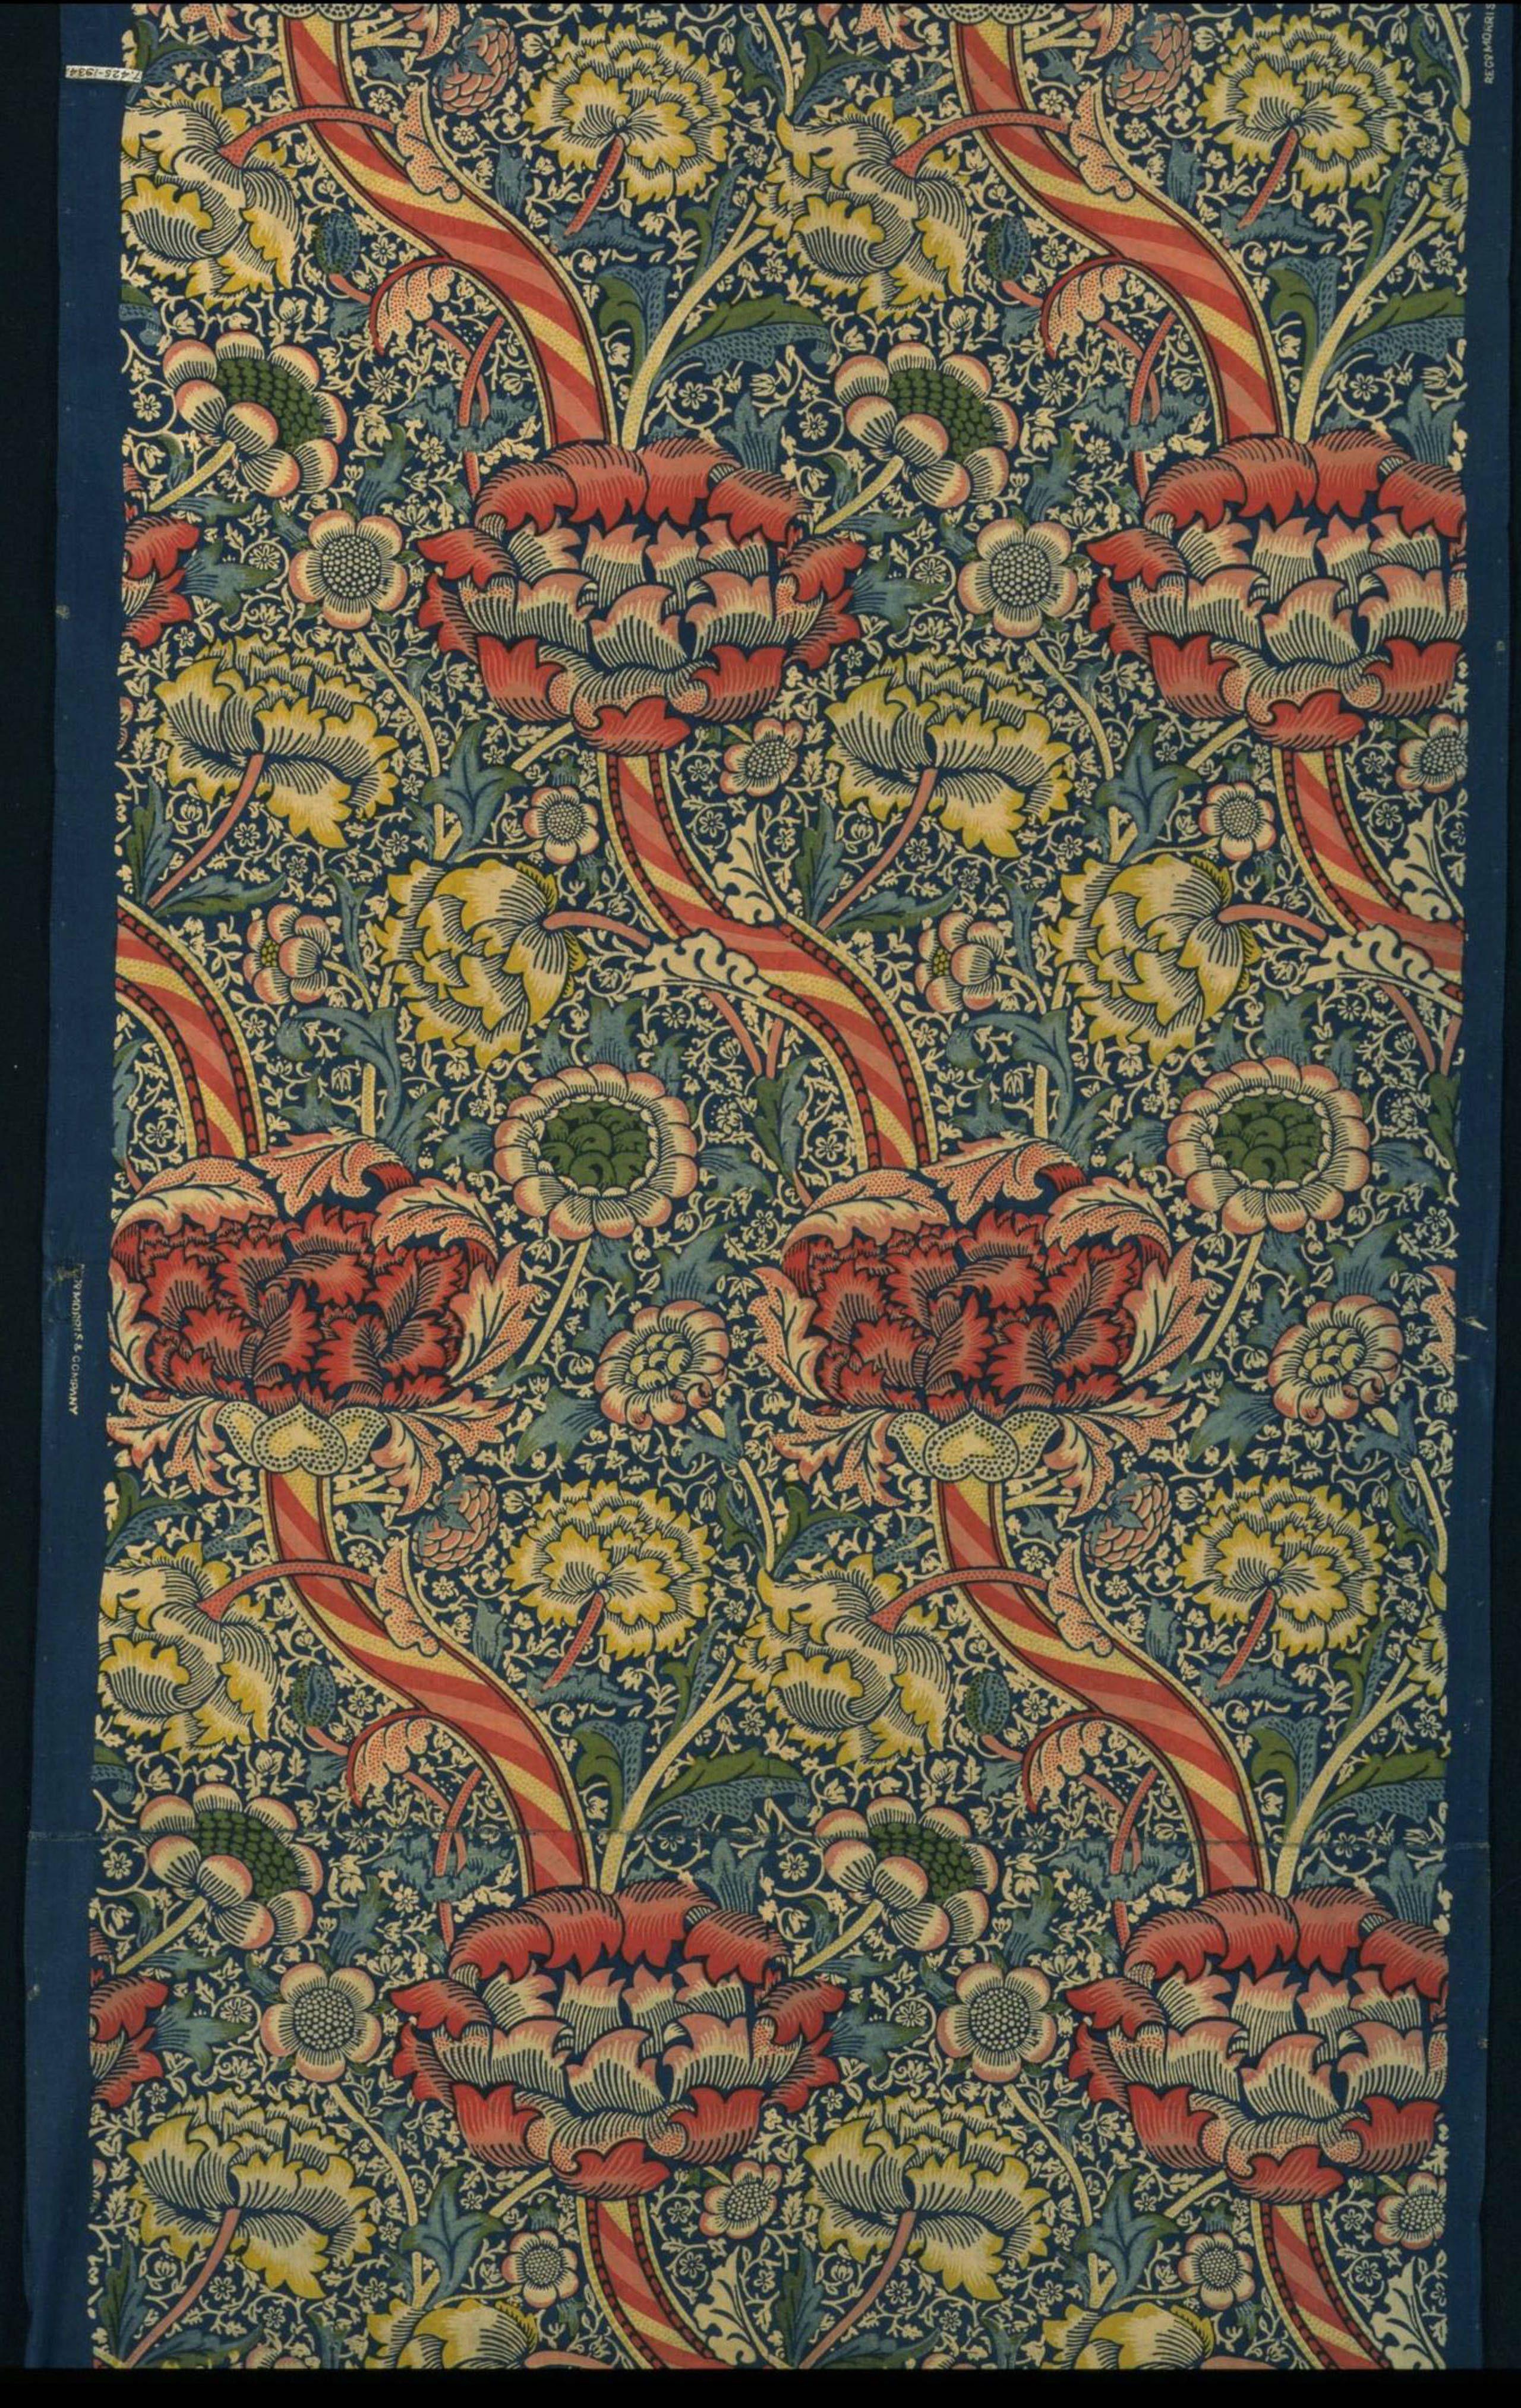 Wandle Design wandle furnishing fabric 1884 william morris walthamstow